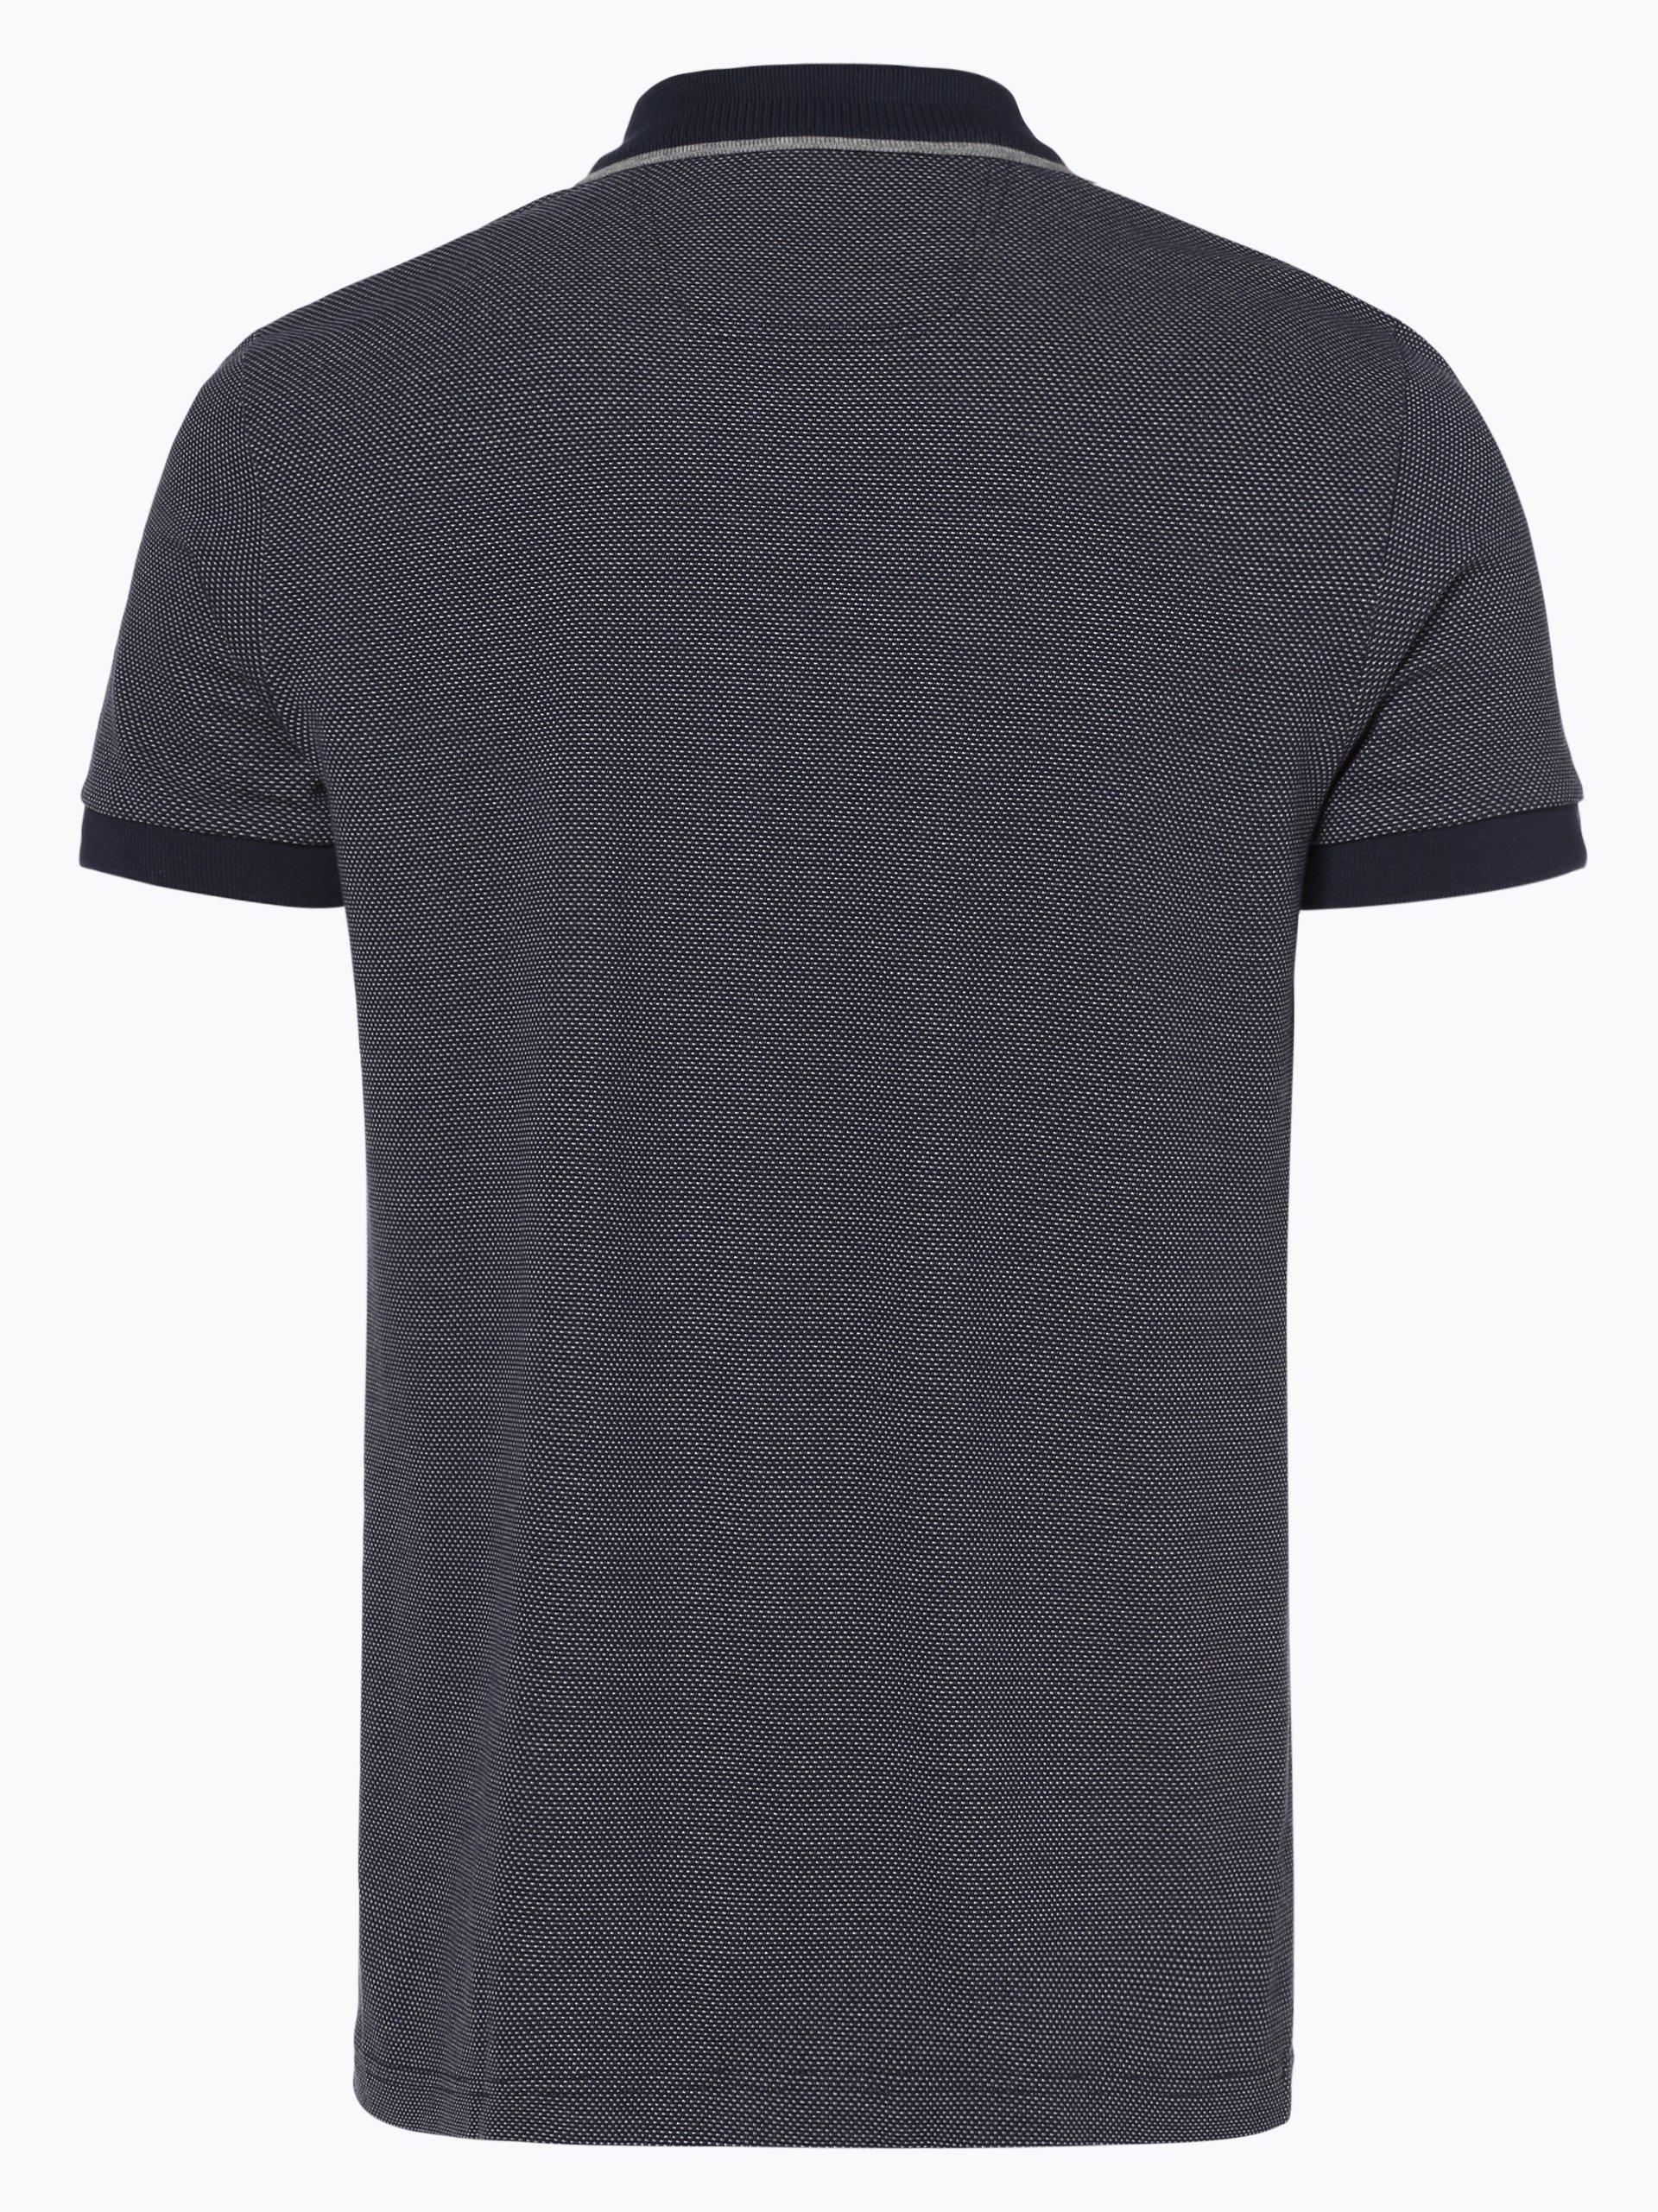 BOSS Athleisurewear Herren Poloshirt - Paddy 2